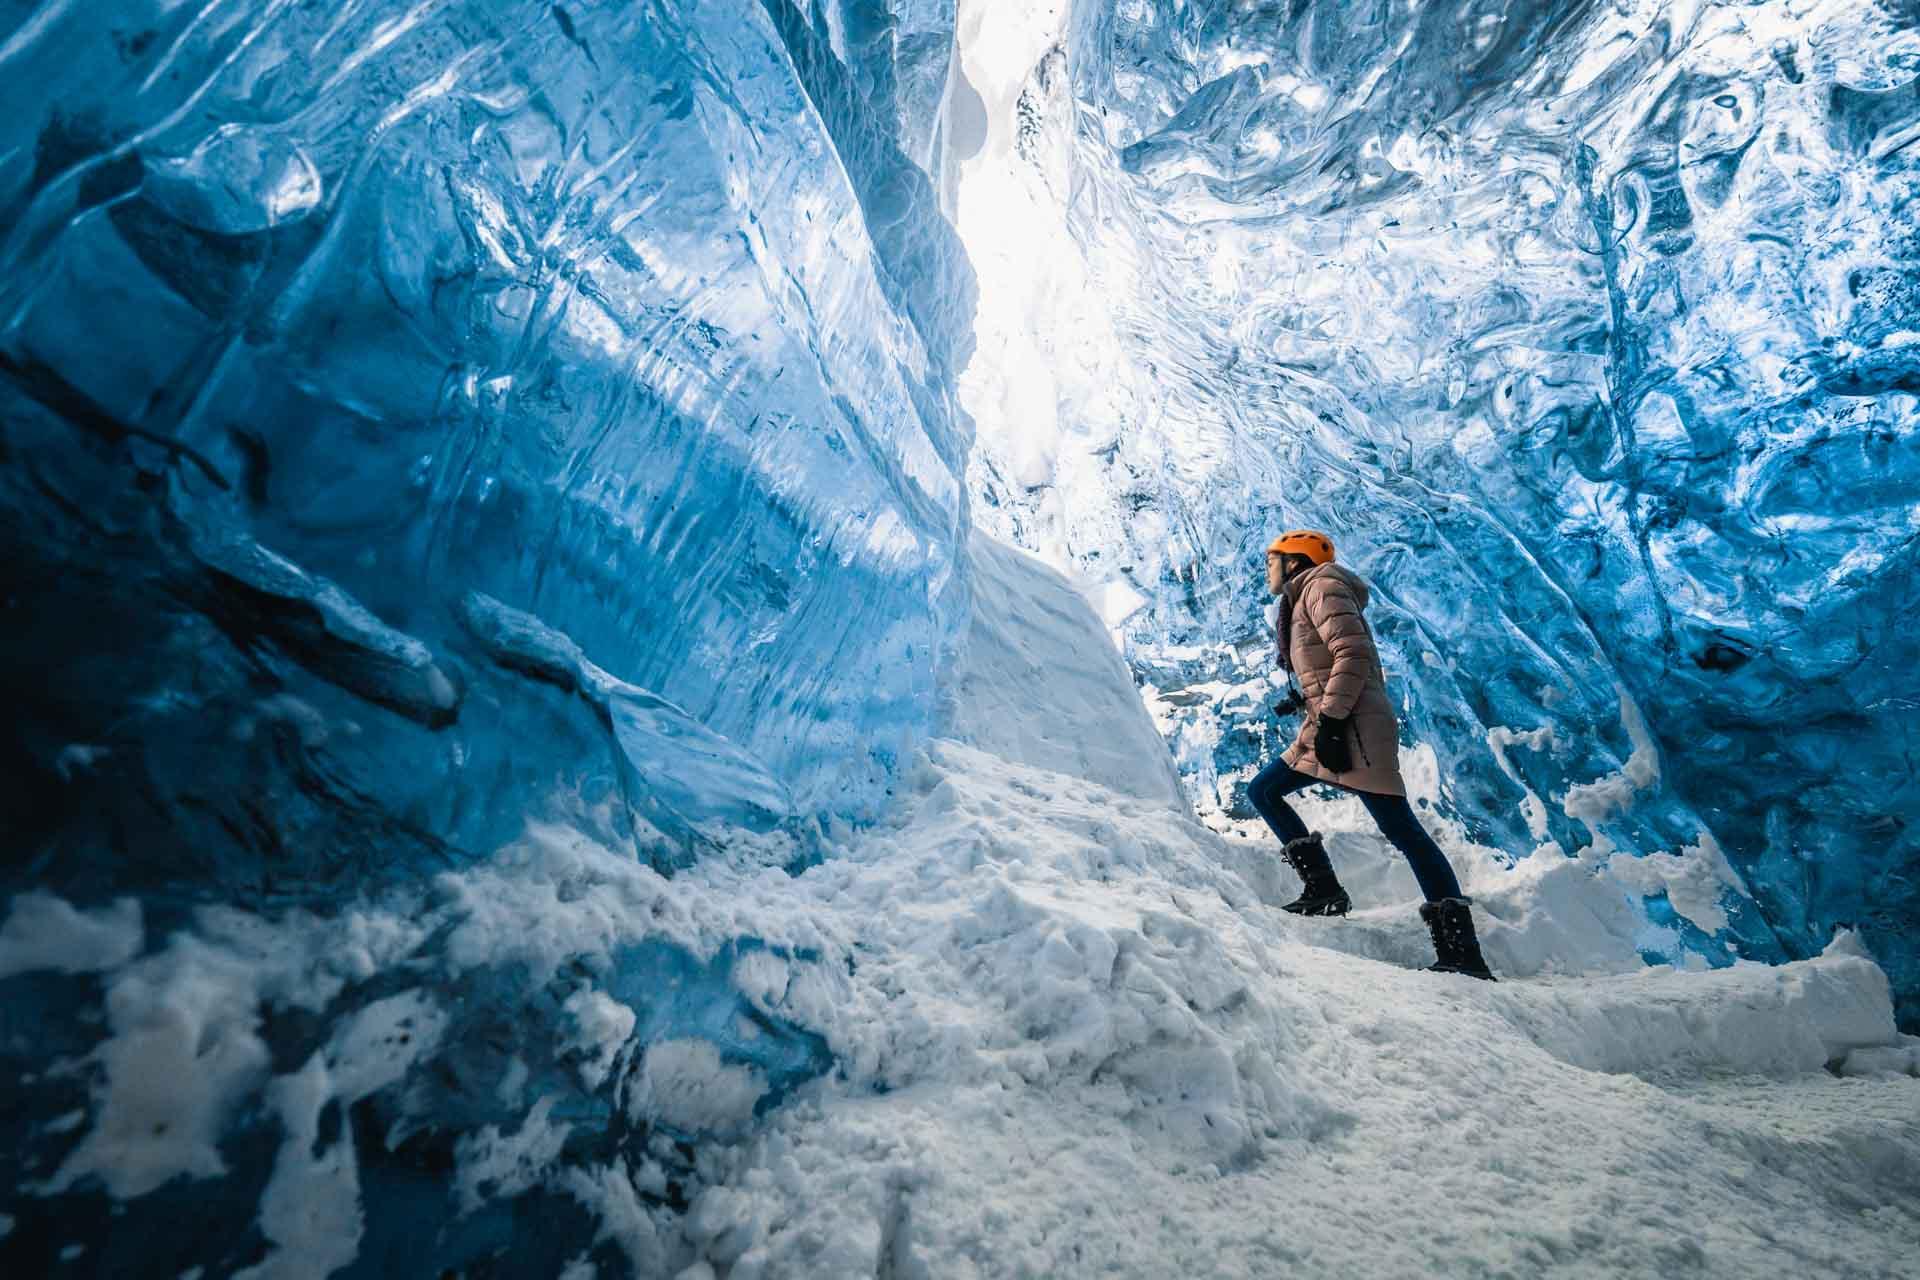 Inside the Blue Diamond Ice Cave